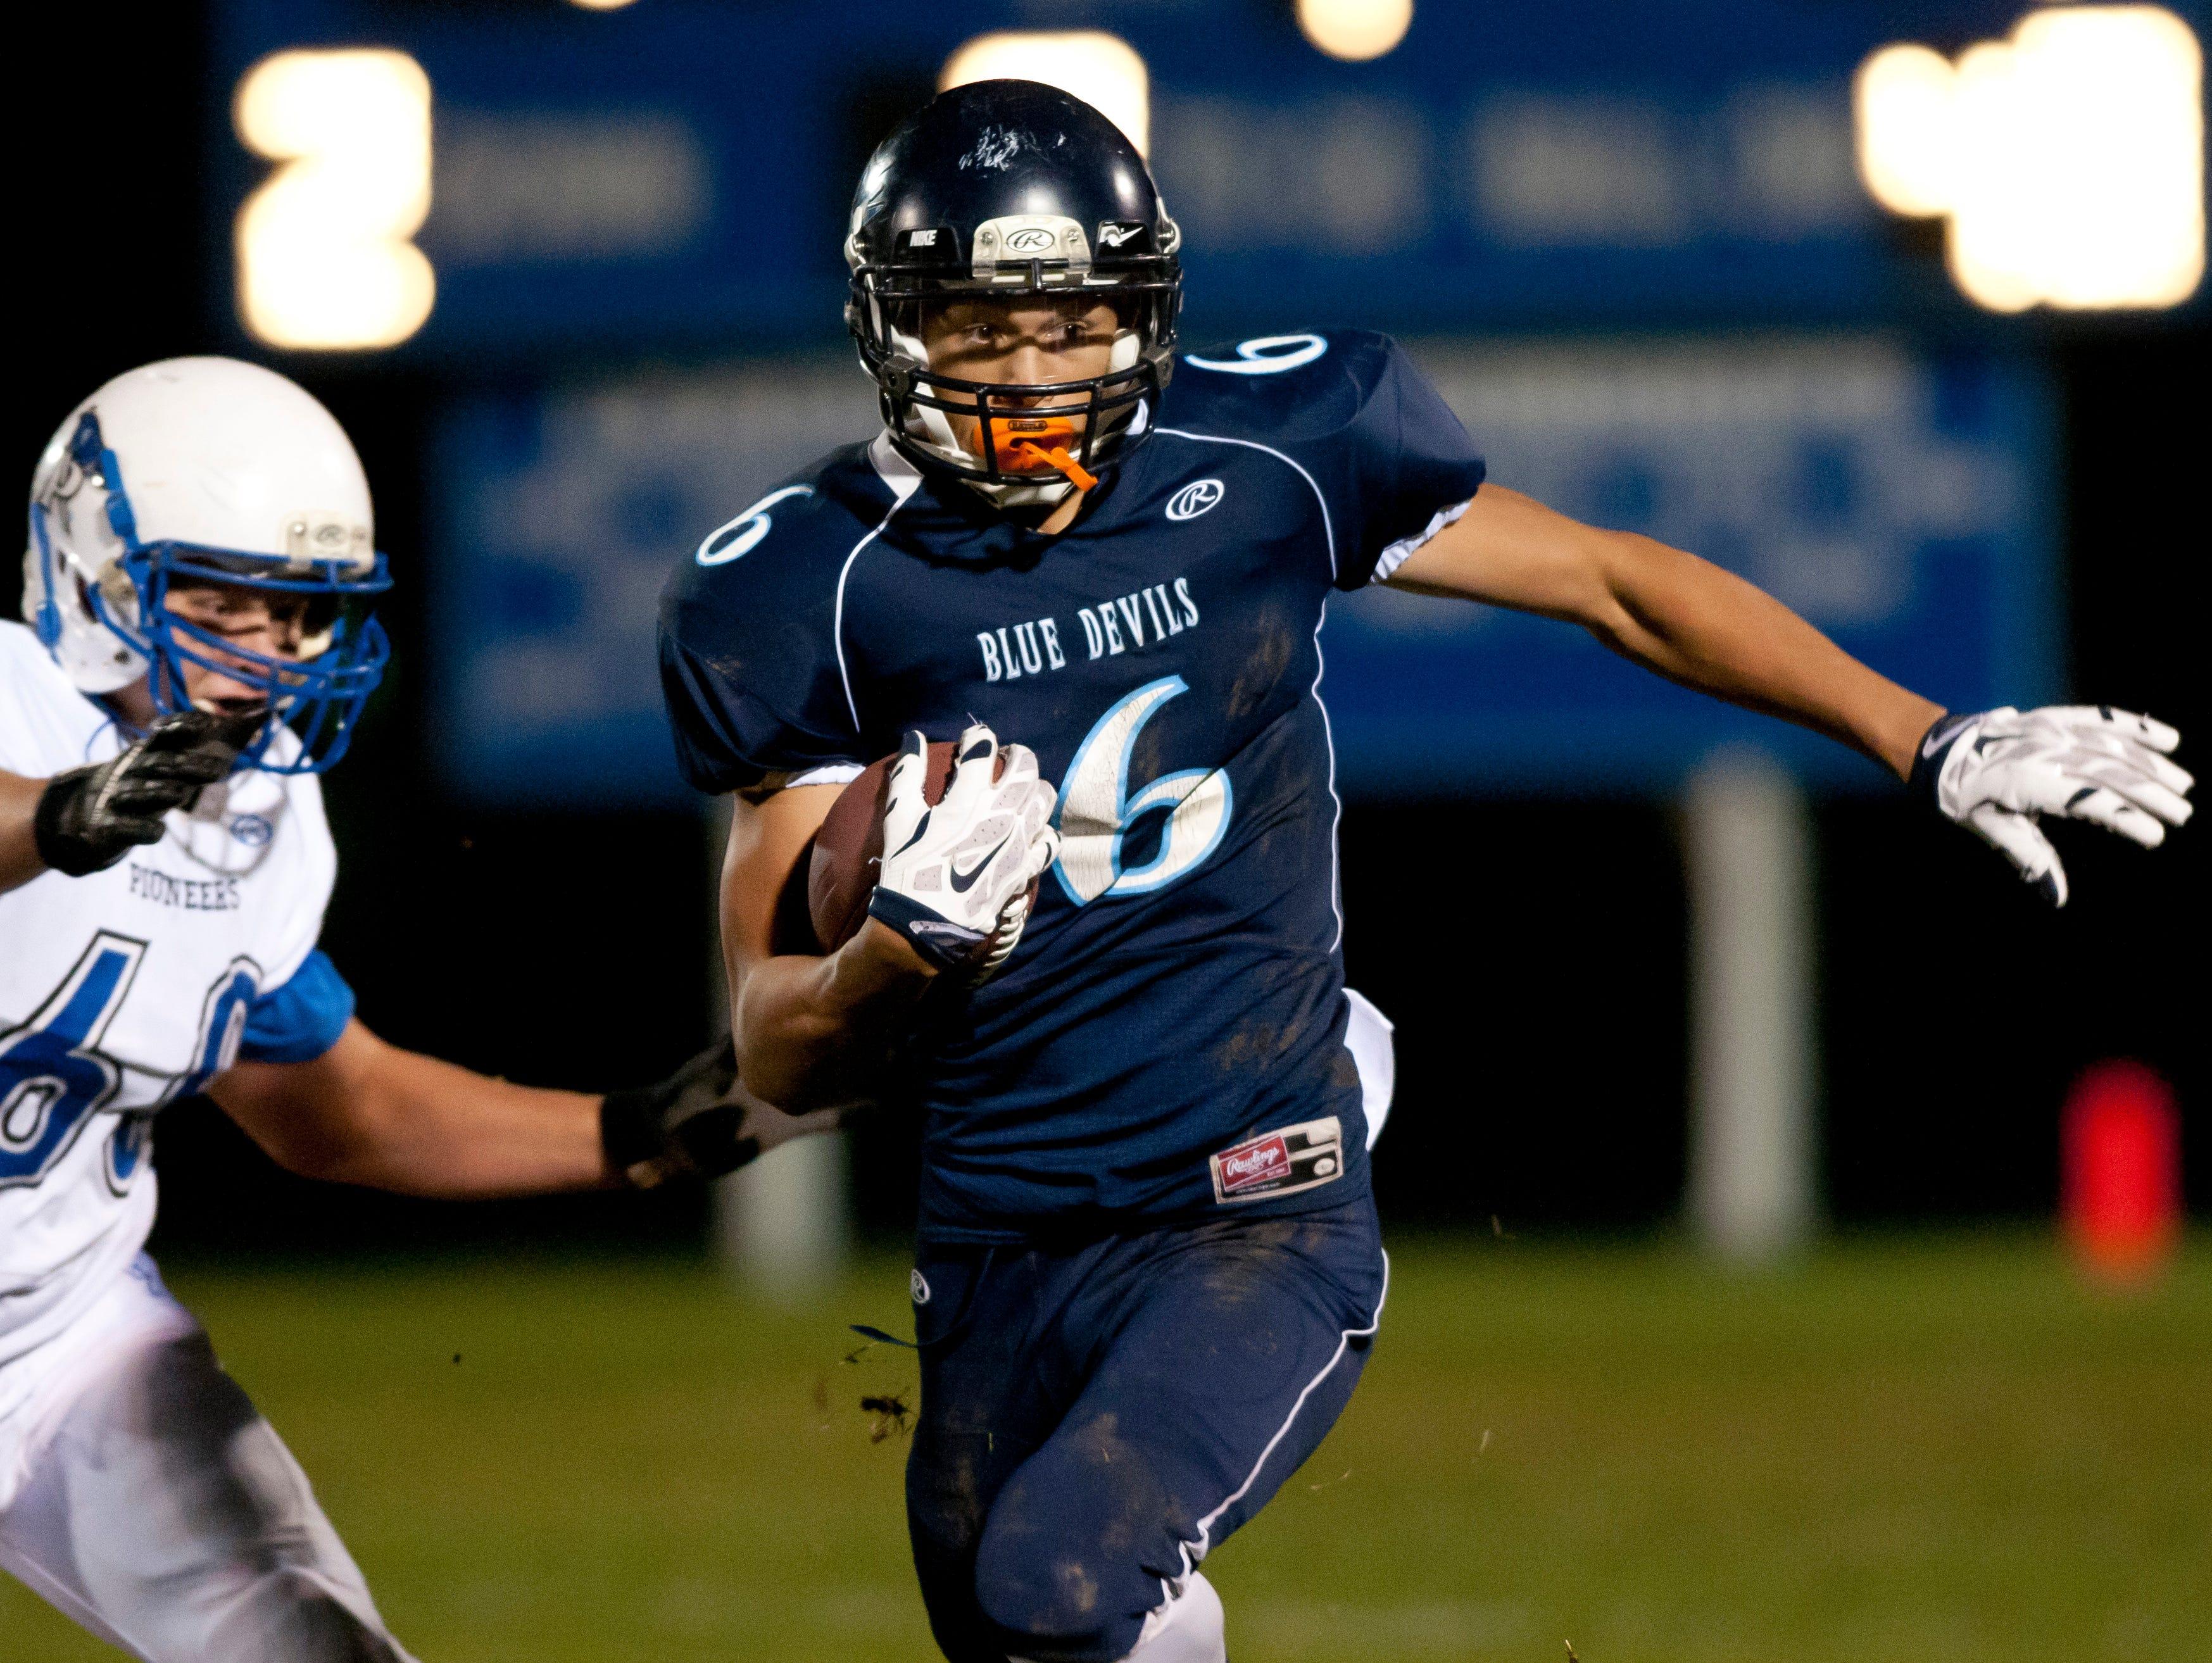 Richmond's D'Sean Hamilton runs the ball during a football game Friday, October 30, 2015 at Richmond High School.